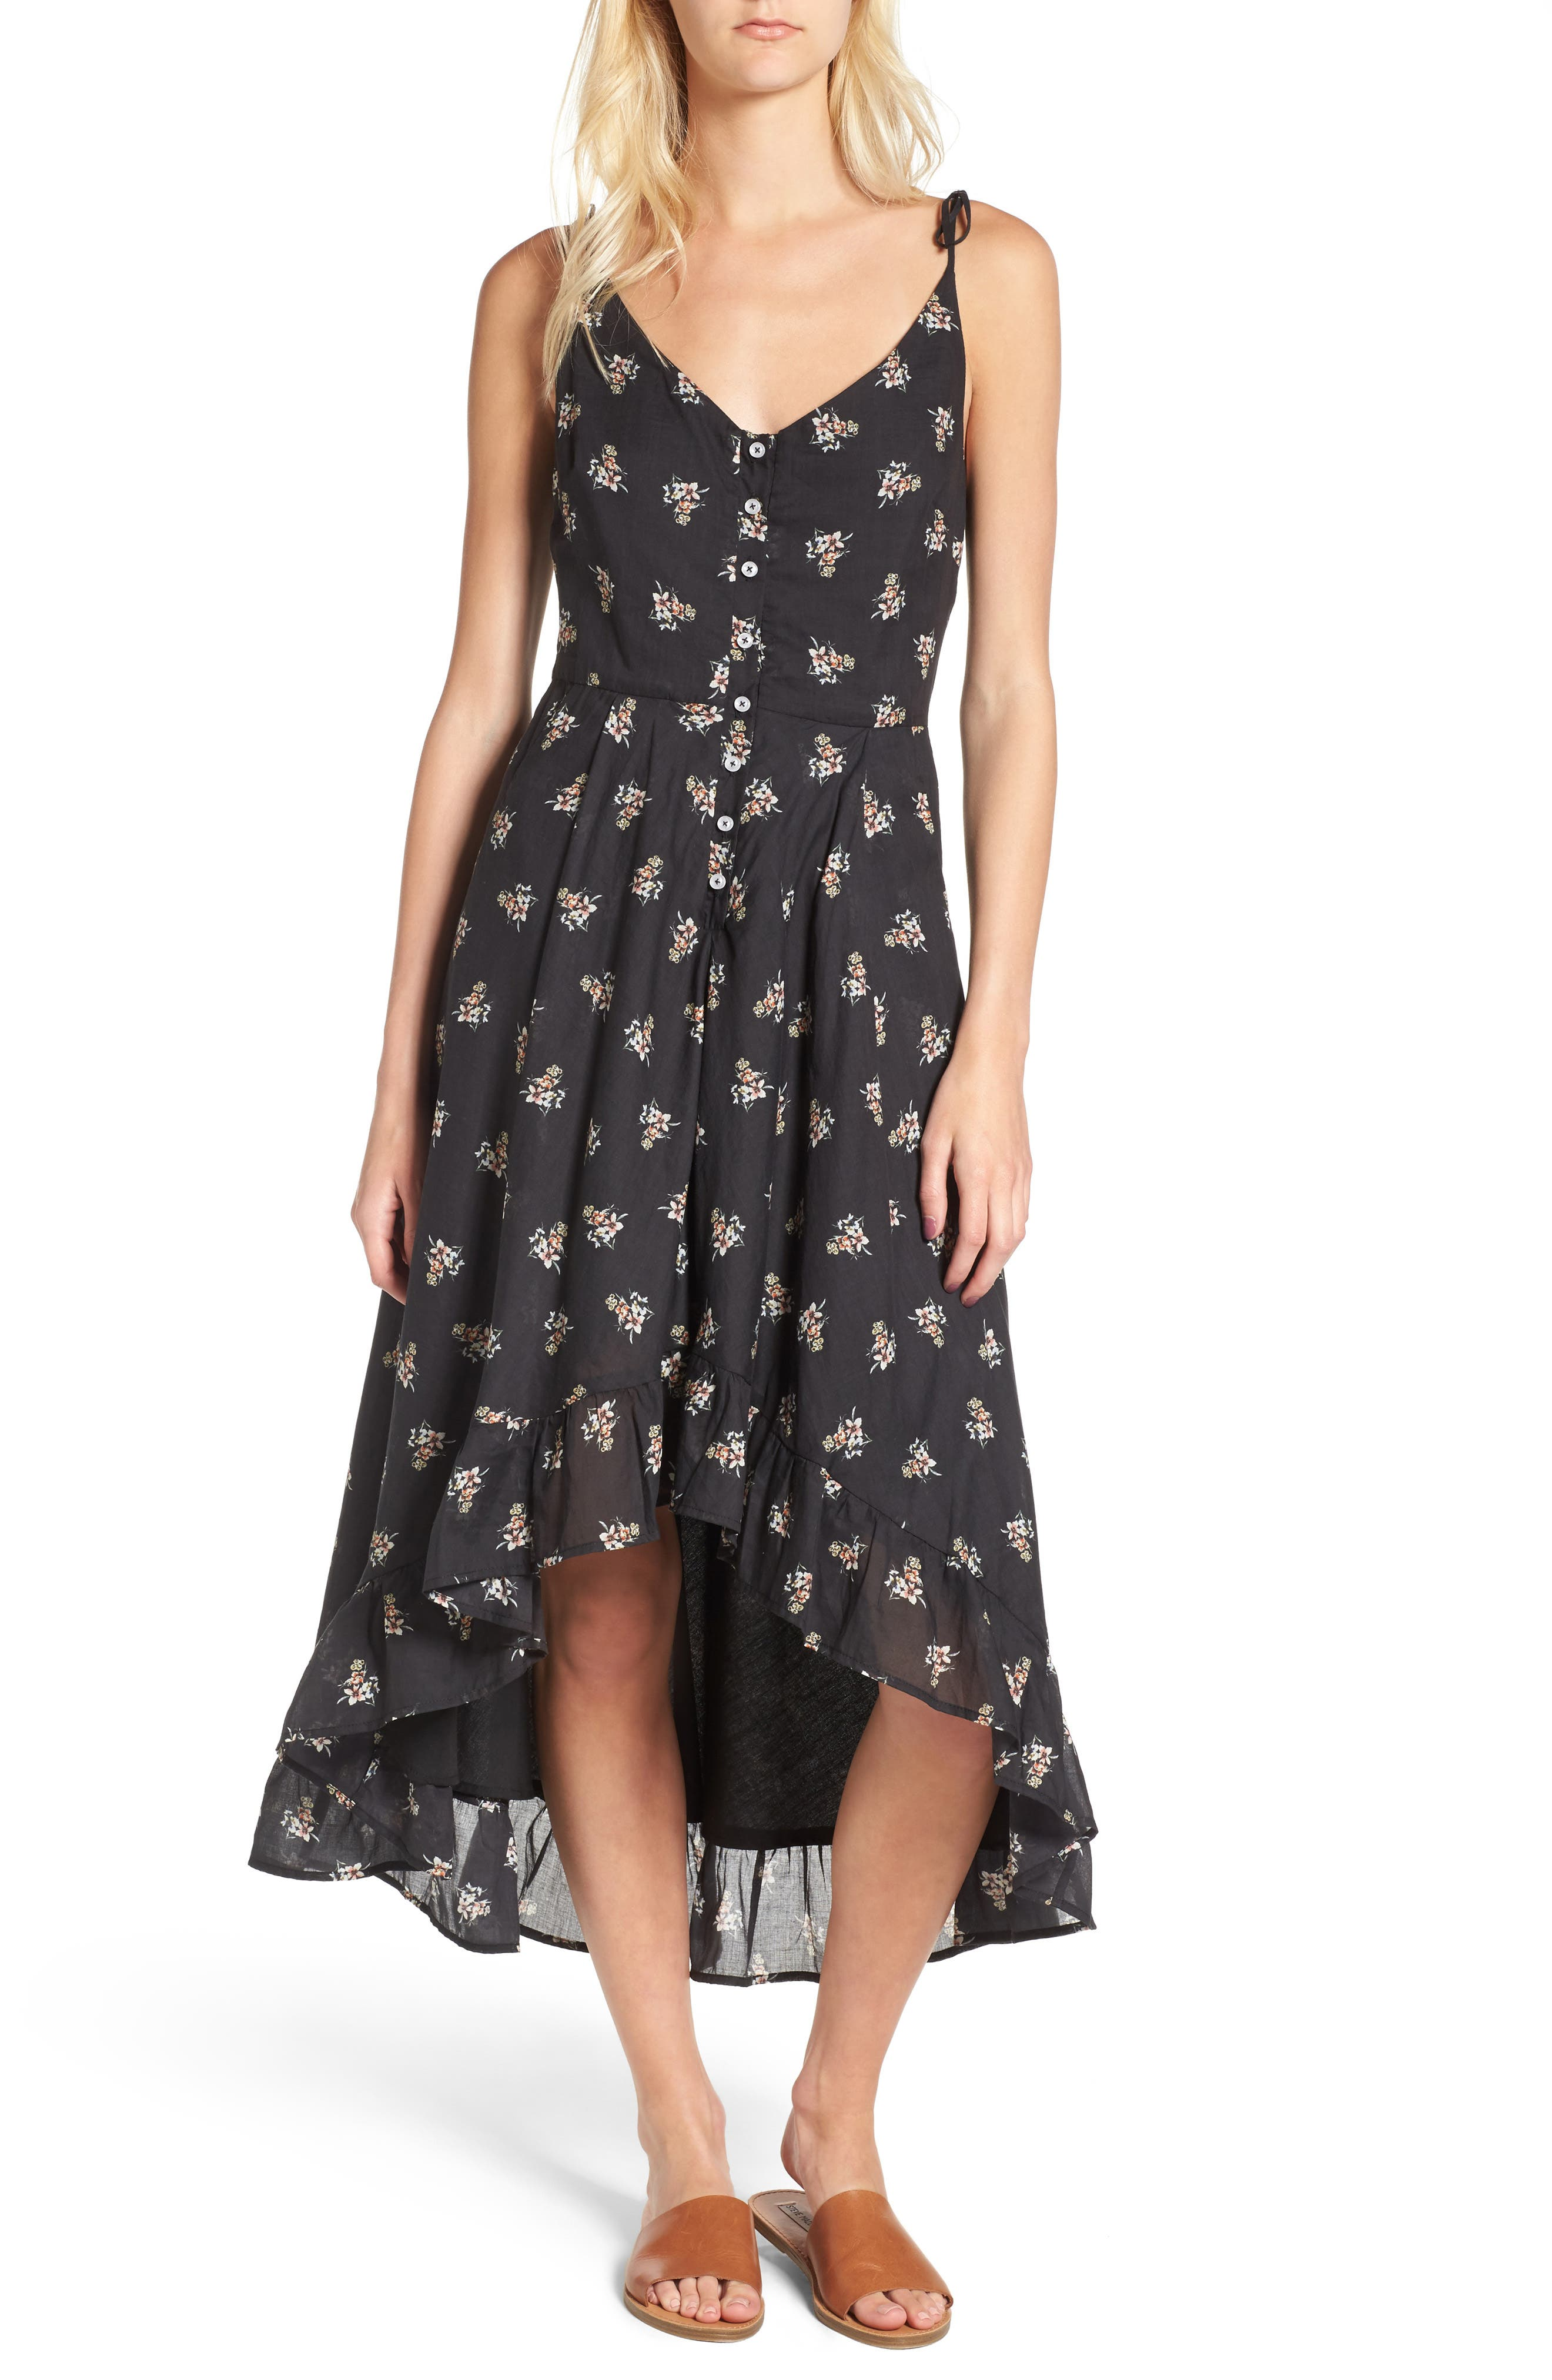 Alternate Image 1 Selected - McGuire Regal Midi Dress